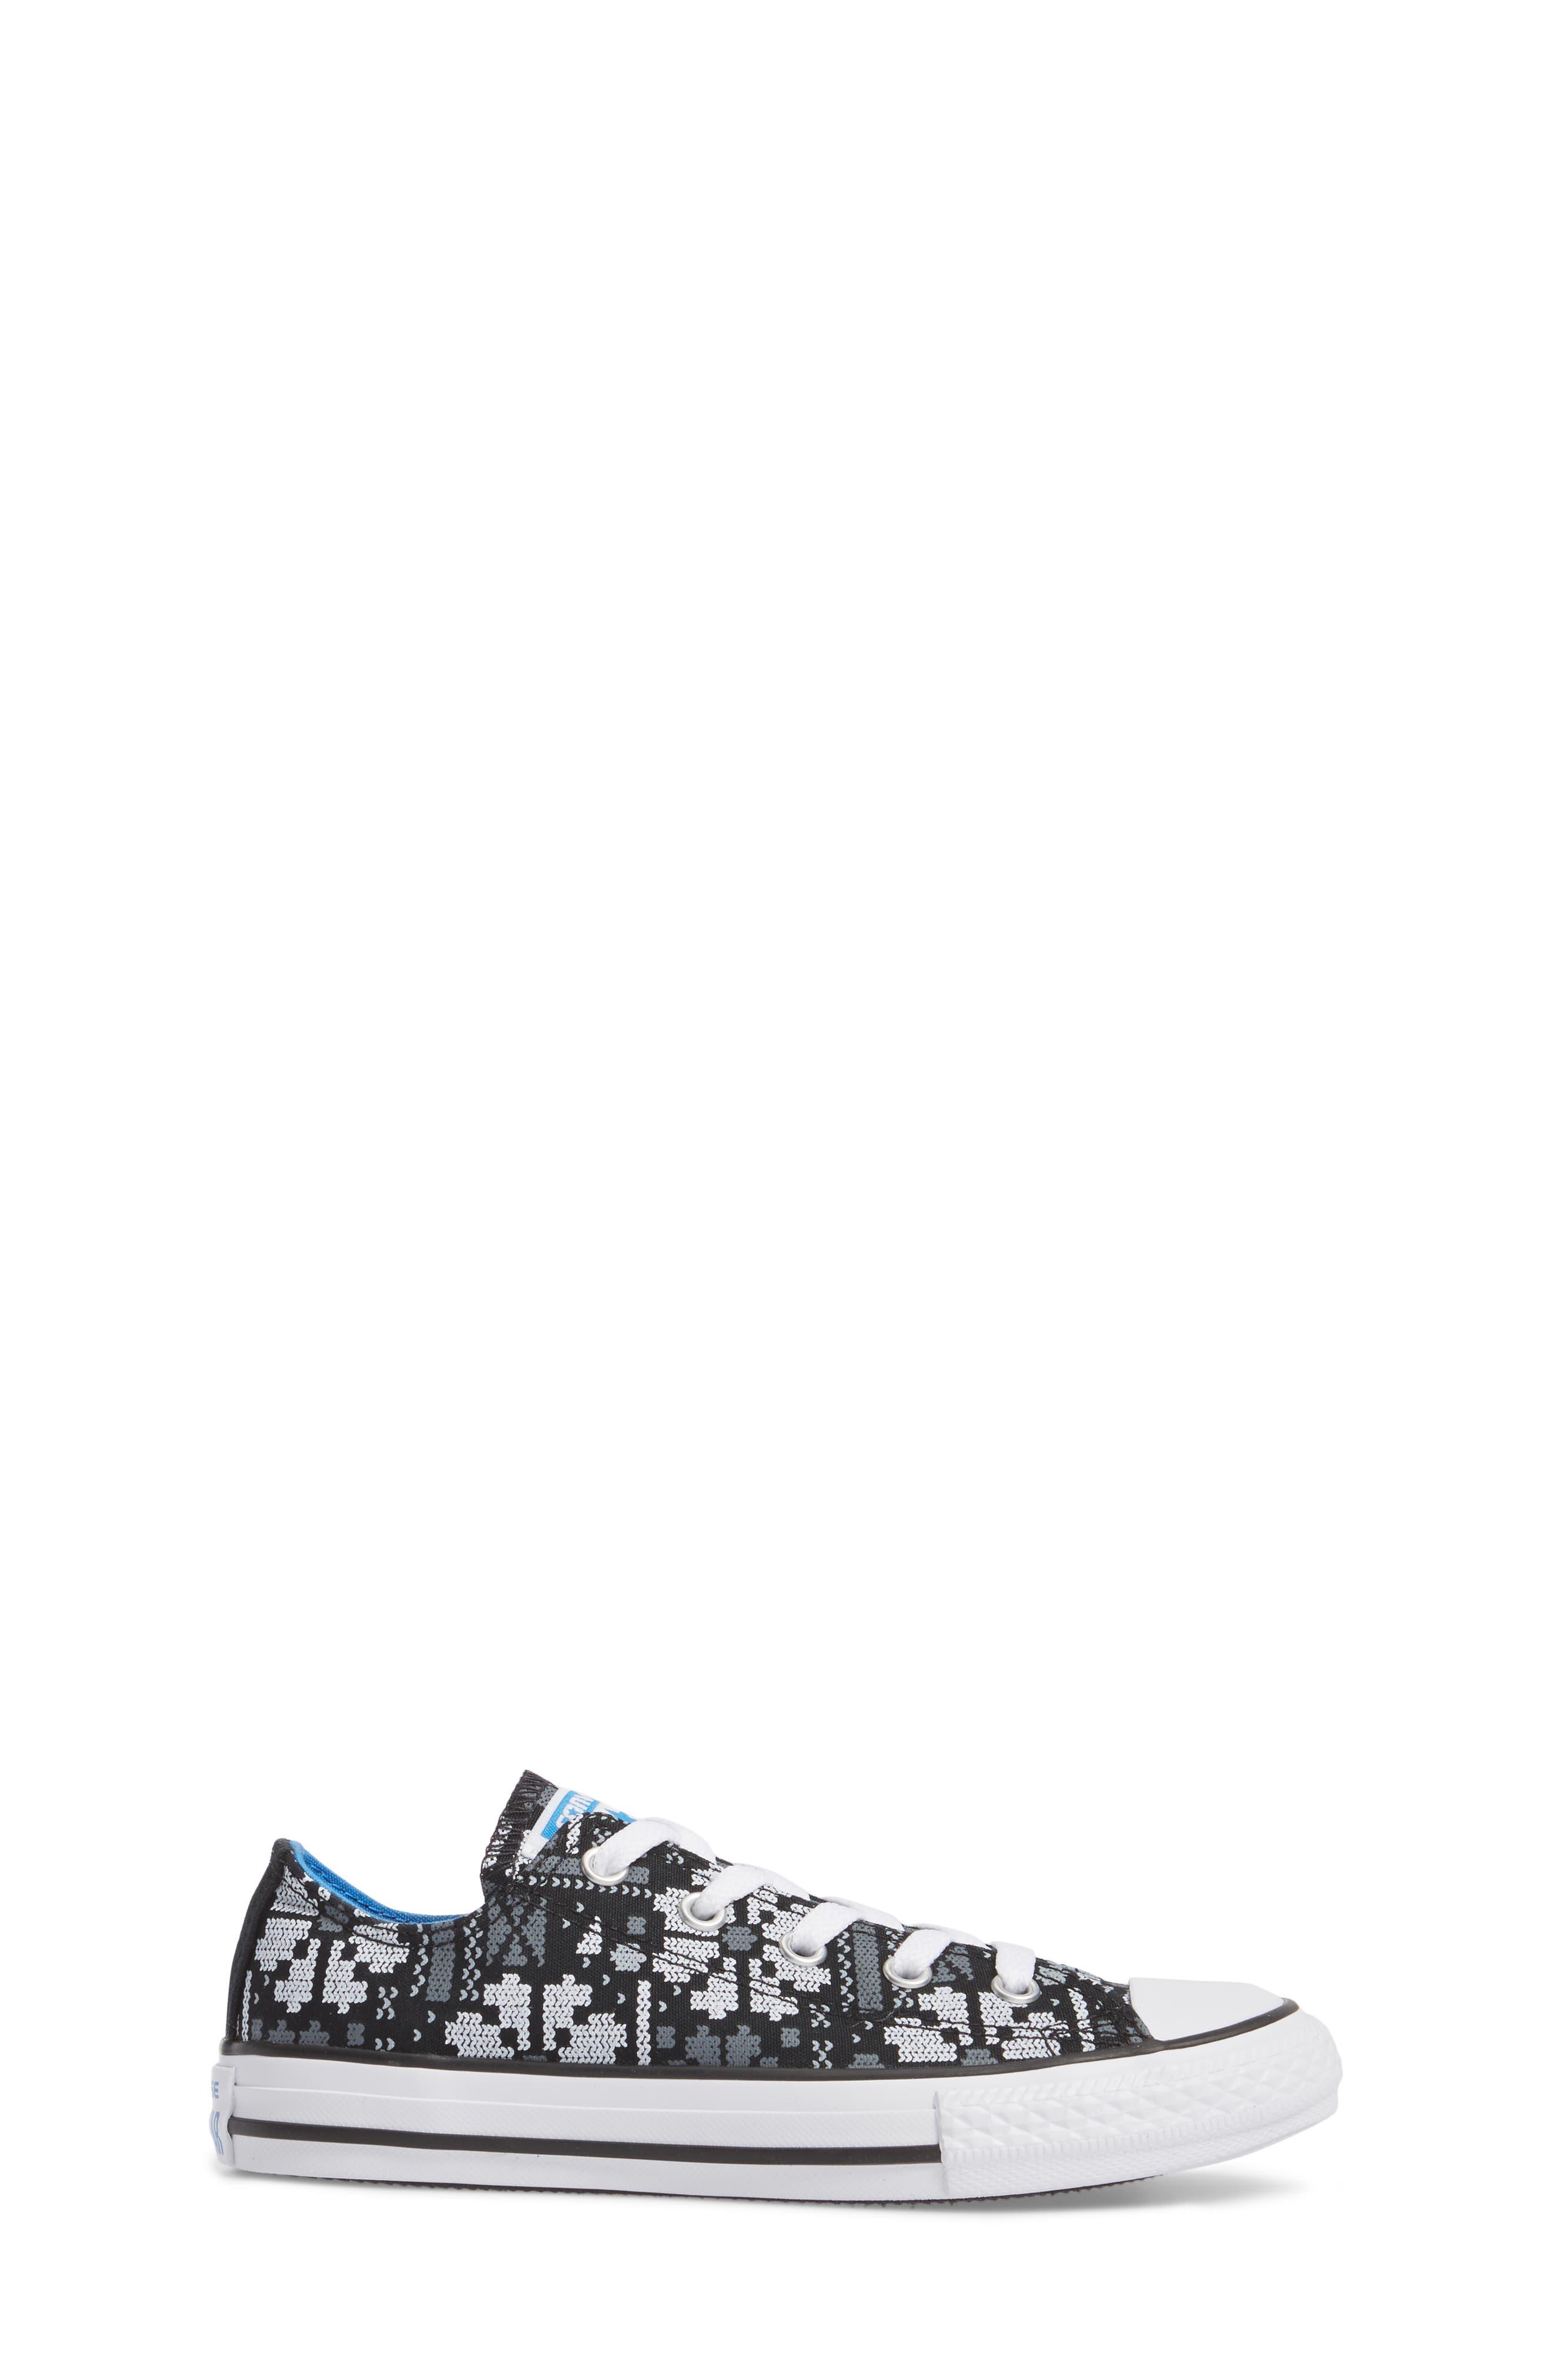 Alternate Image 3  - Converse Chuck Taylor® All Star® Winter Ox Sneaker (Toddler, Little Kid & Big Kid)